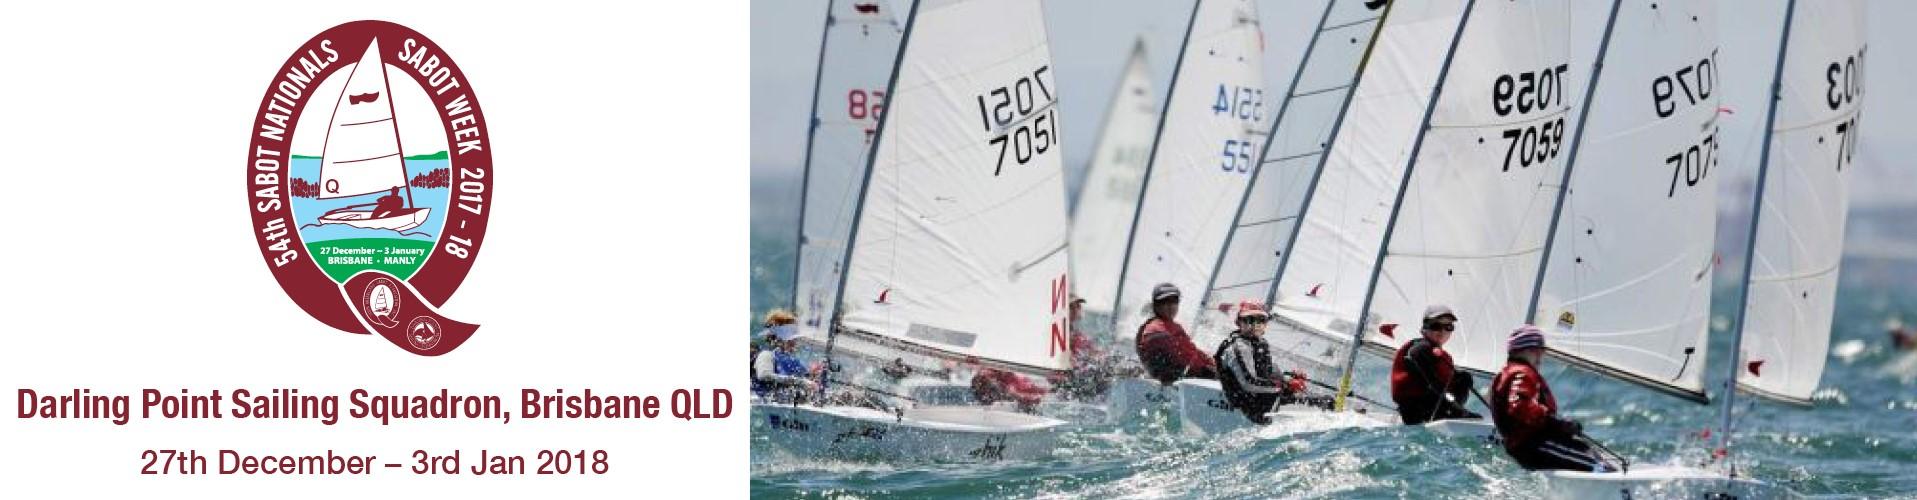 2017-2018 Sabot Nationals Darling Point Sailing Squadron. Brisbane QLD